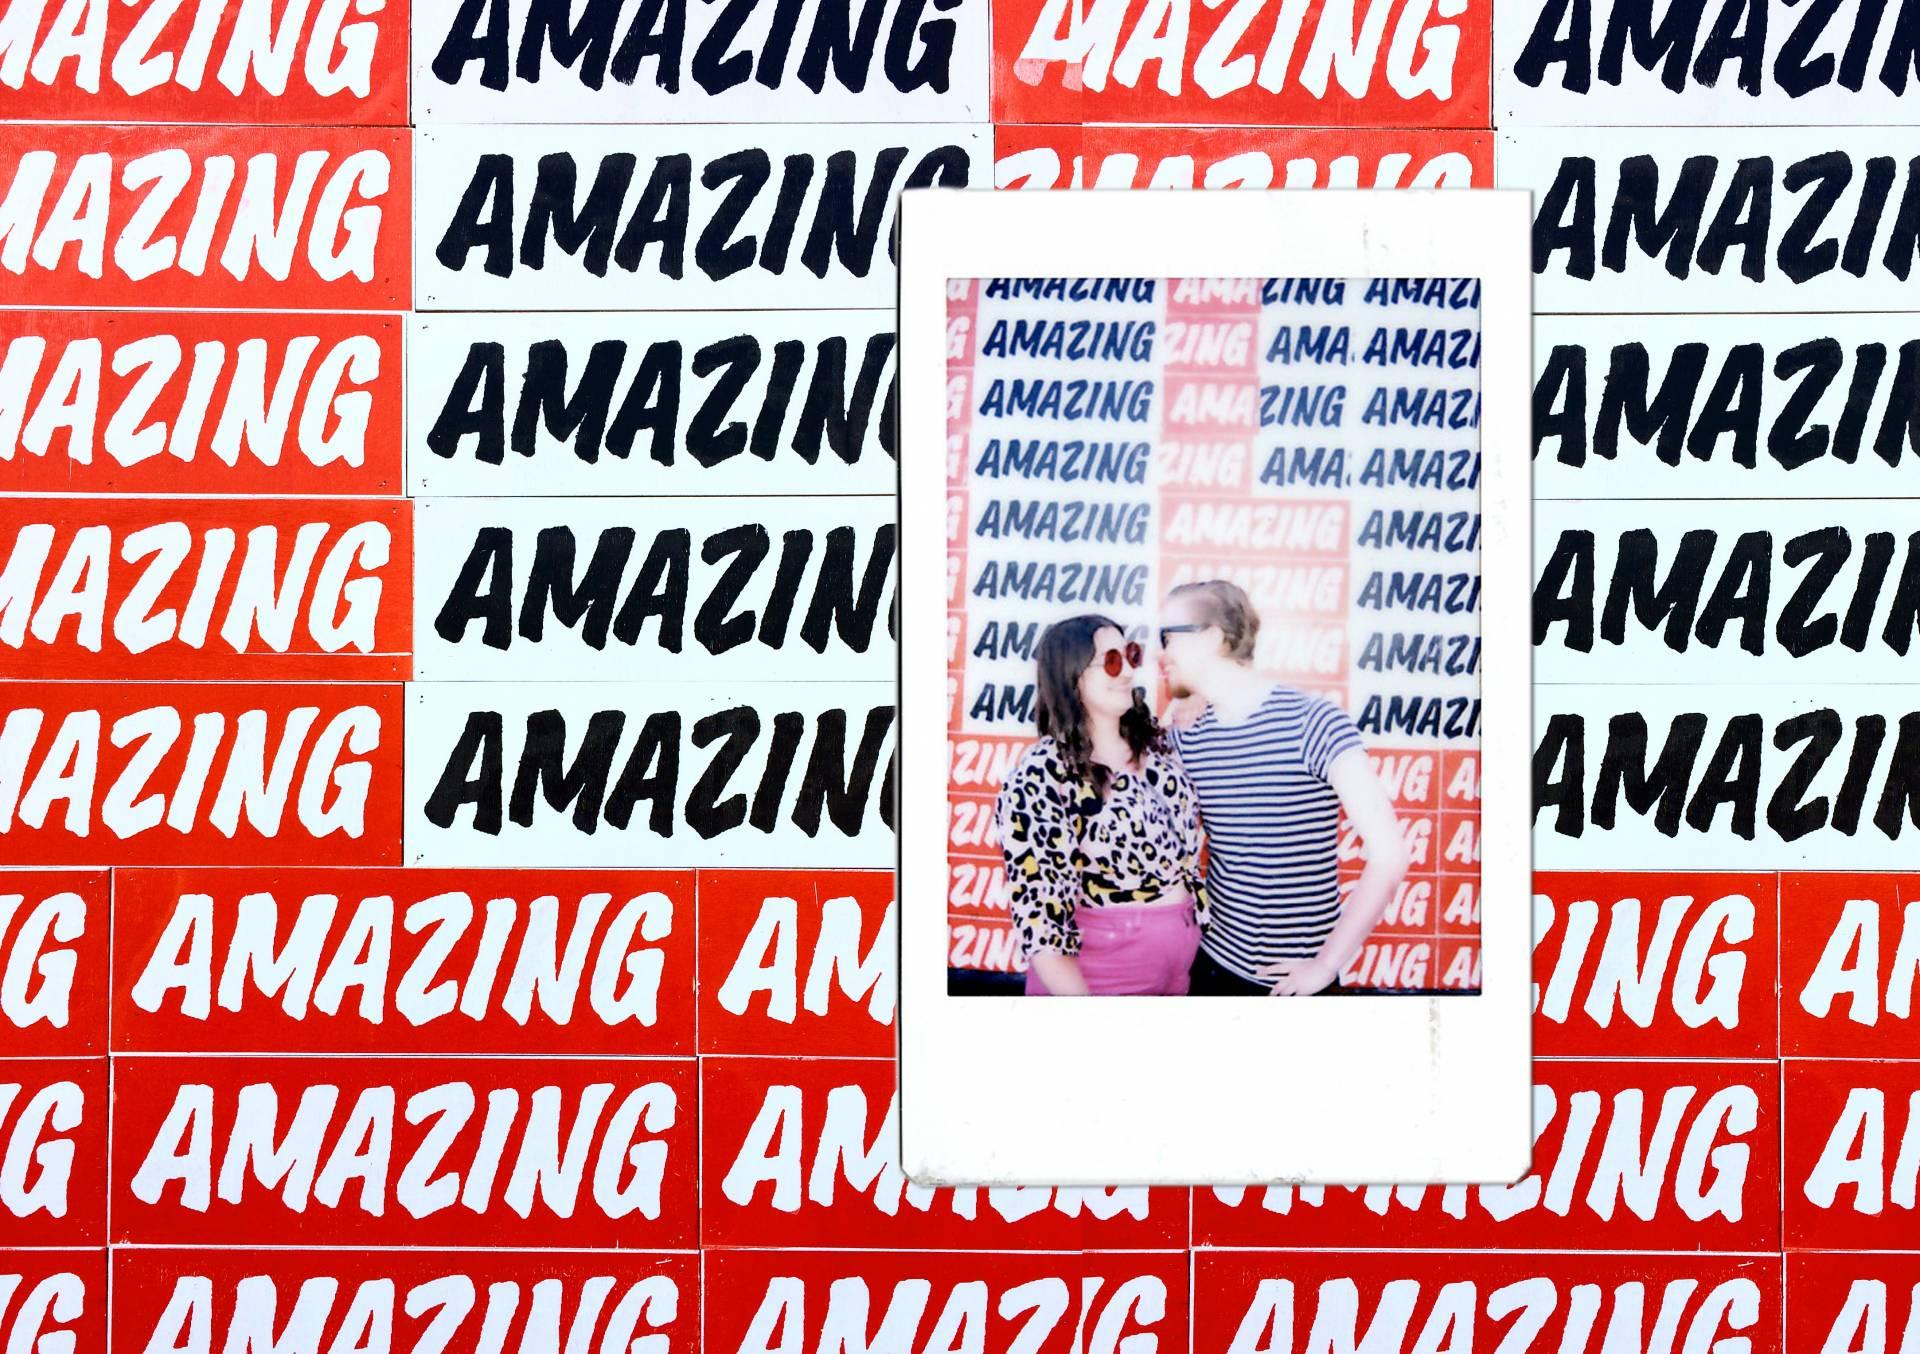 http://graphiquefantastique.com/wp-content/uploads/2018/08/AmazingAmazing.jpg